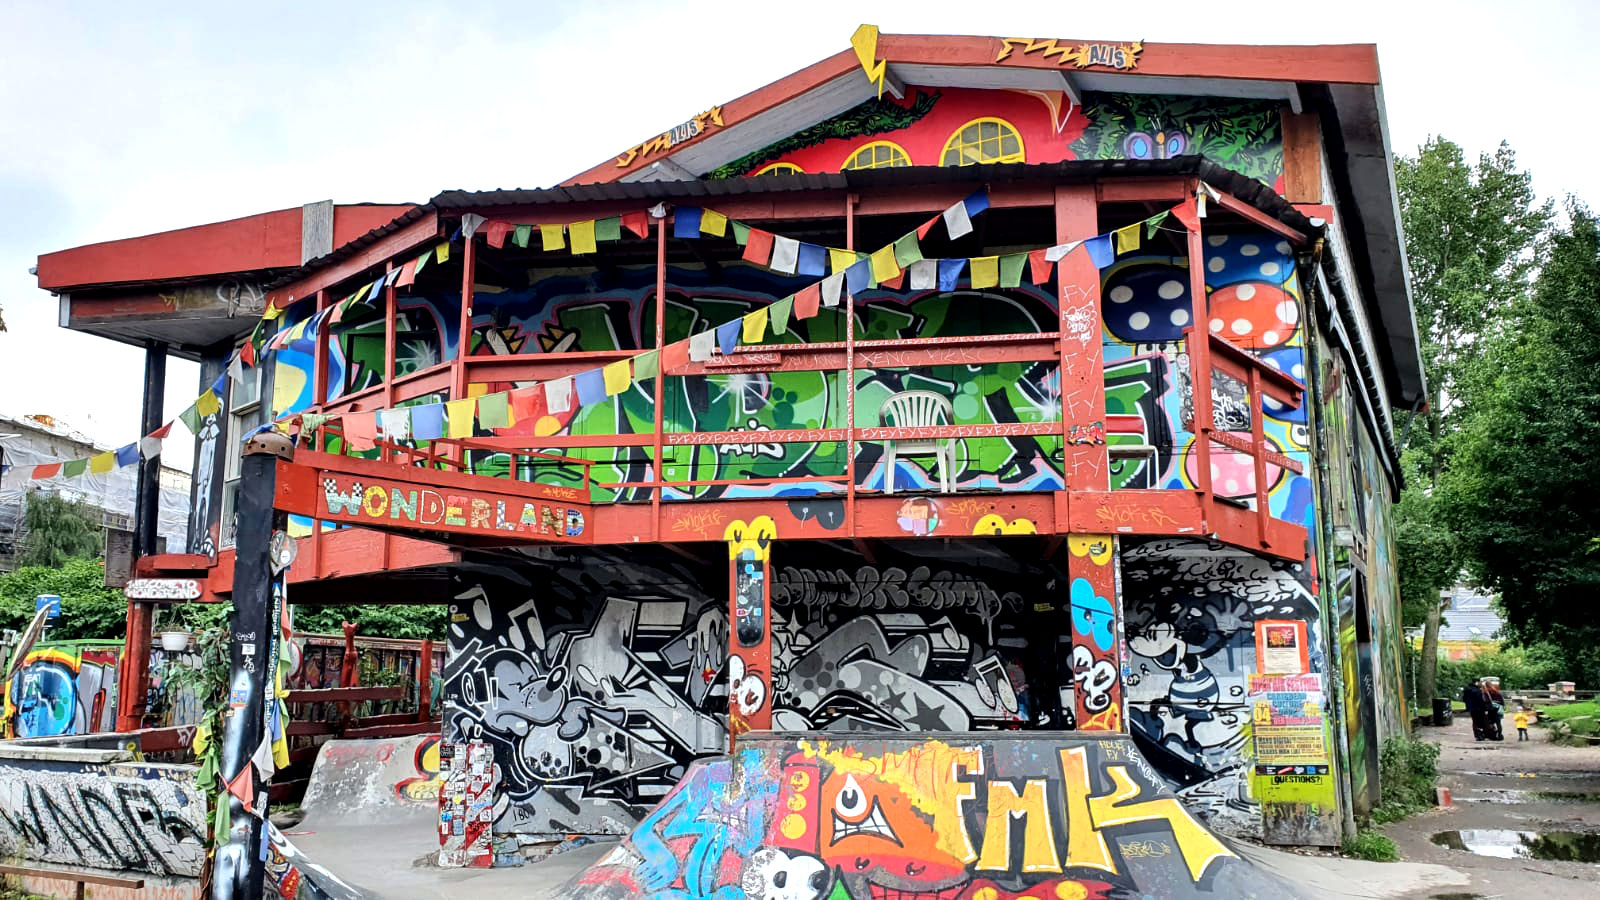 Talo Christianiassa, valokuva.